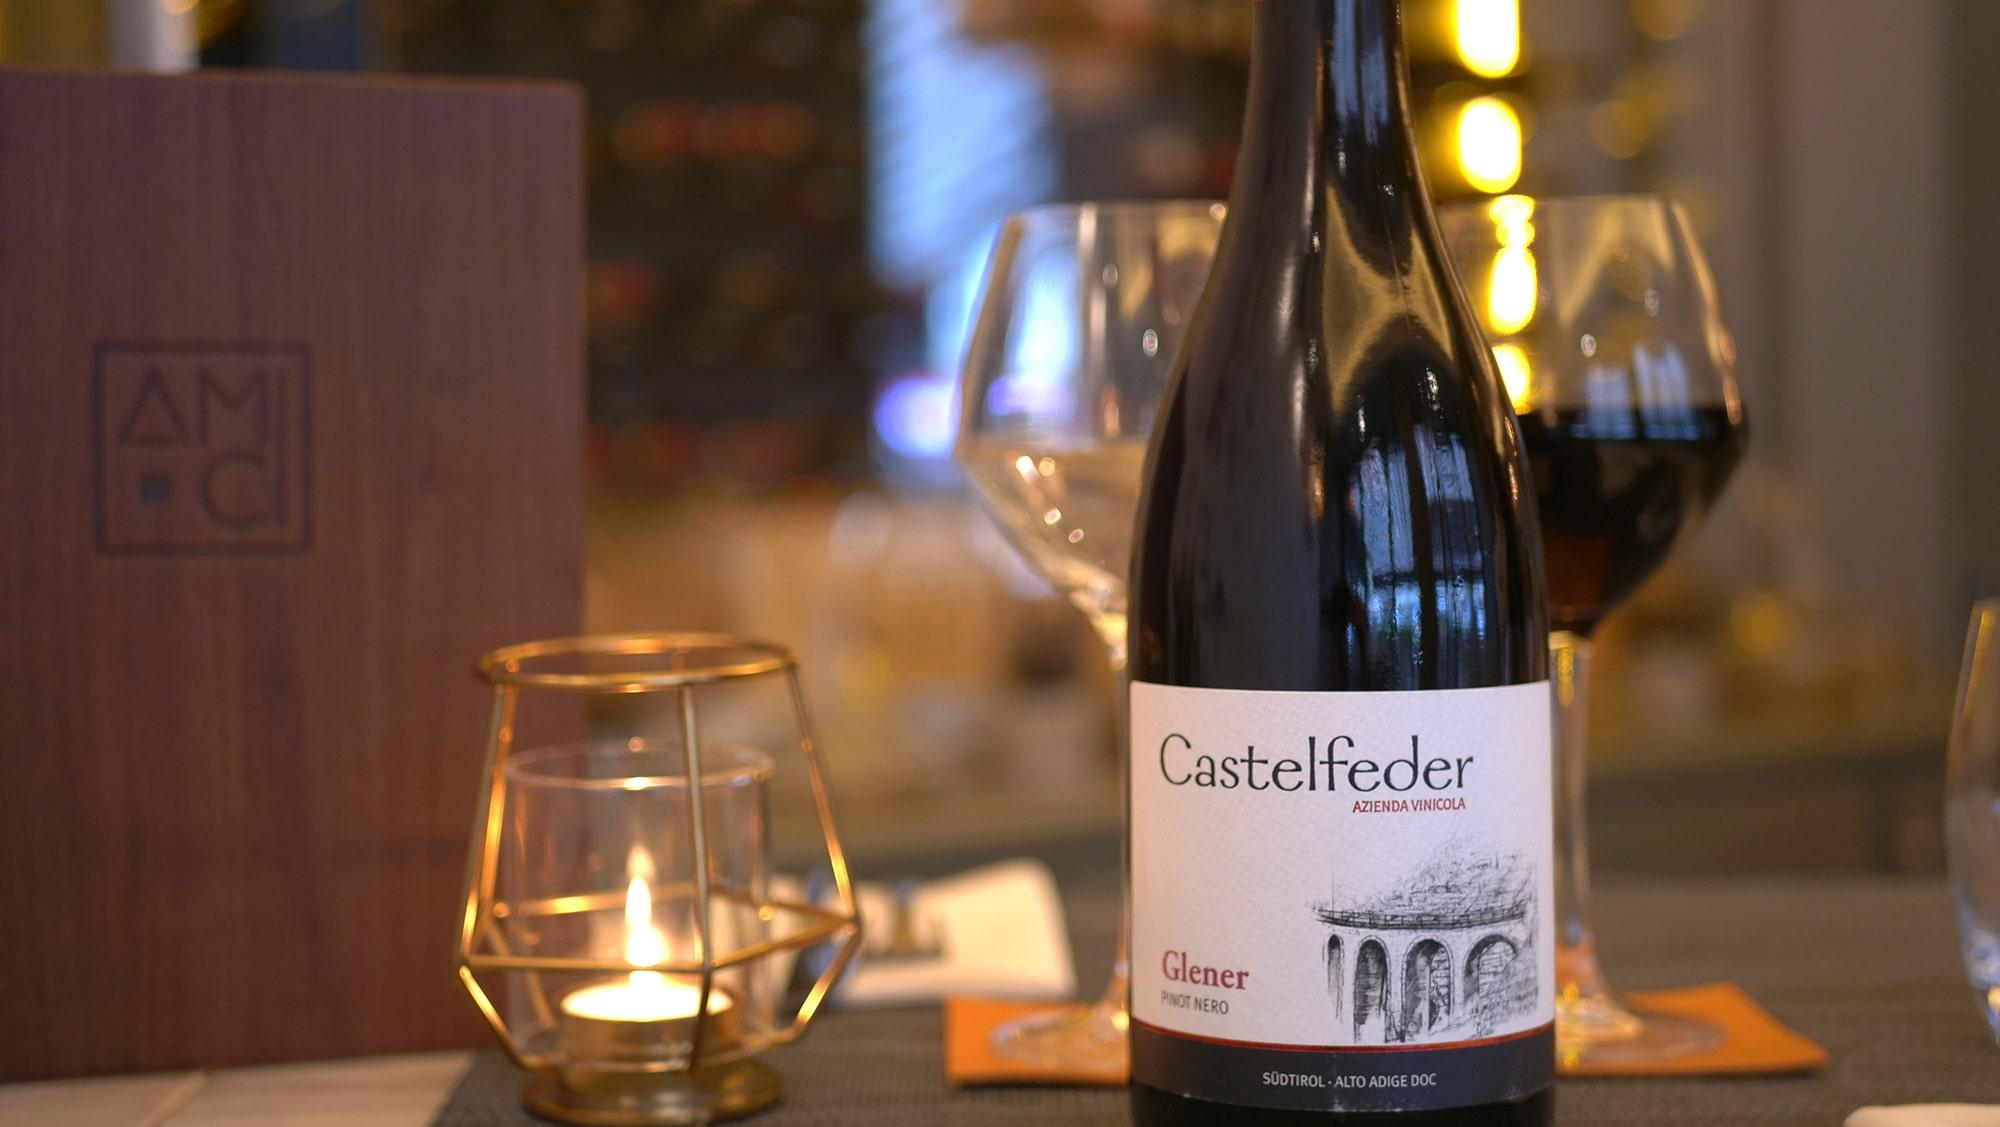 Castelfeder Pinot Nero - Amici 2017